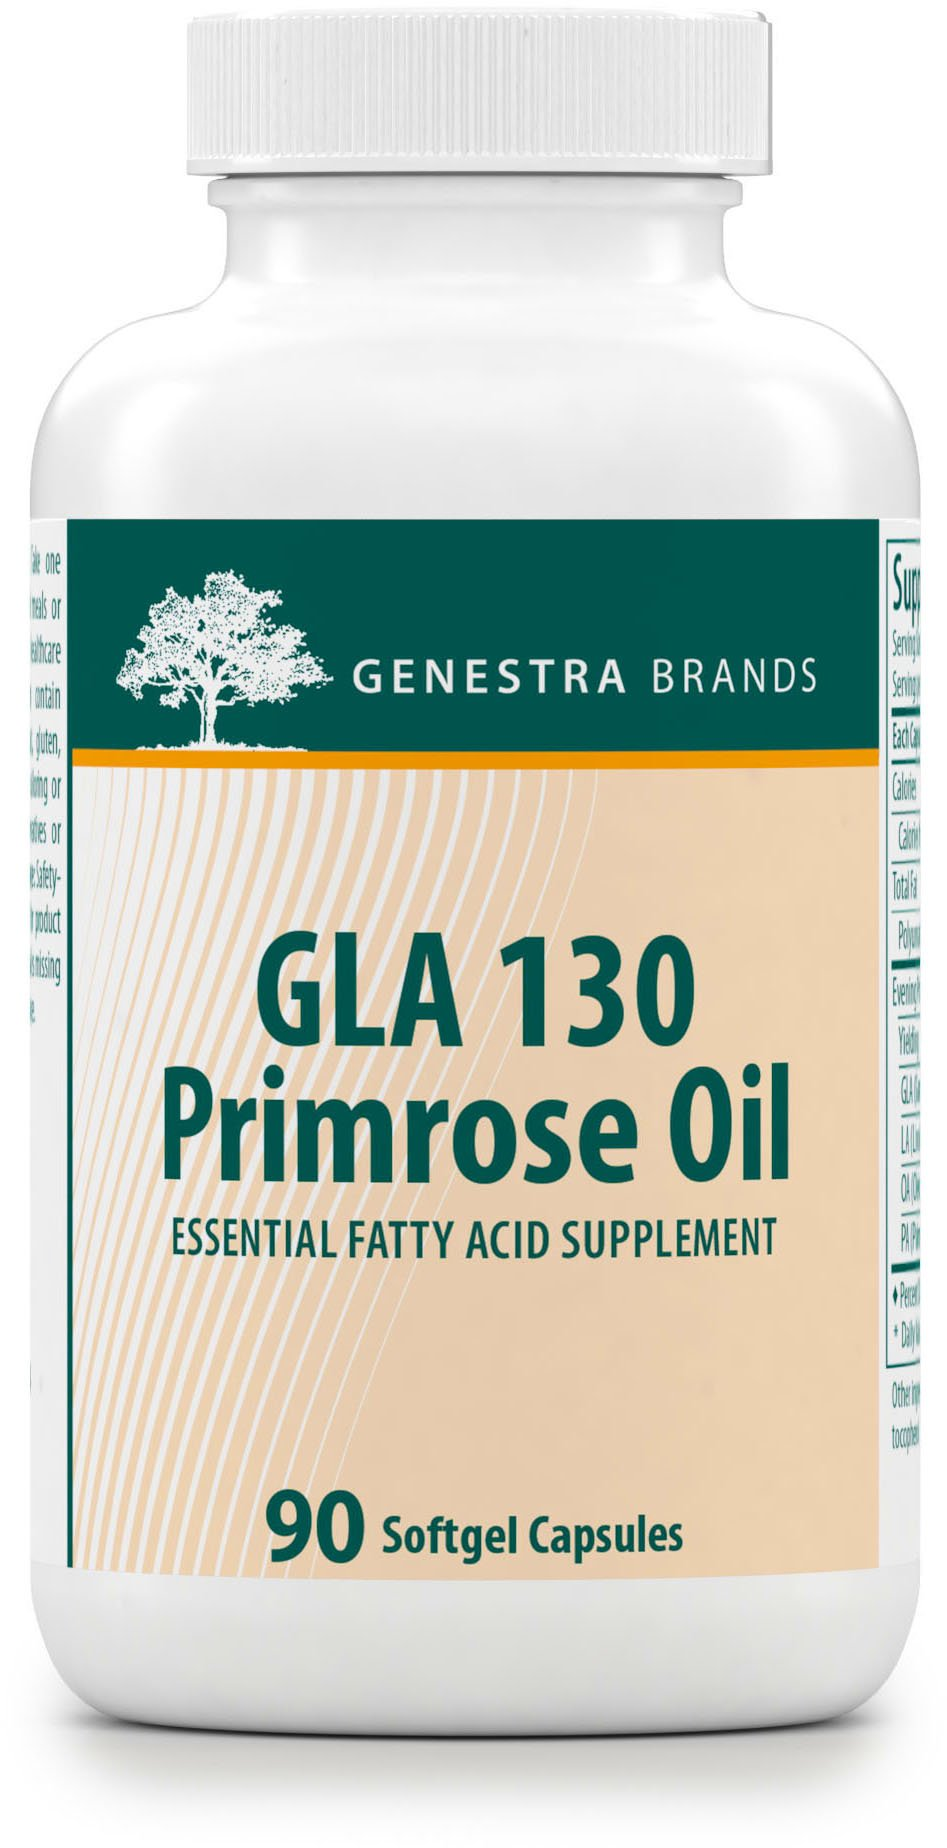 Genestra - GLA 130 Primrose Oil 90 Count